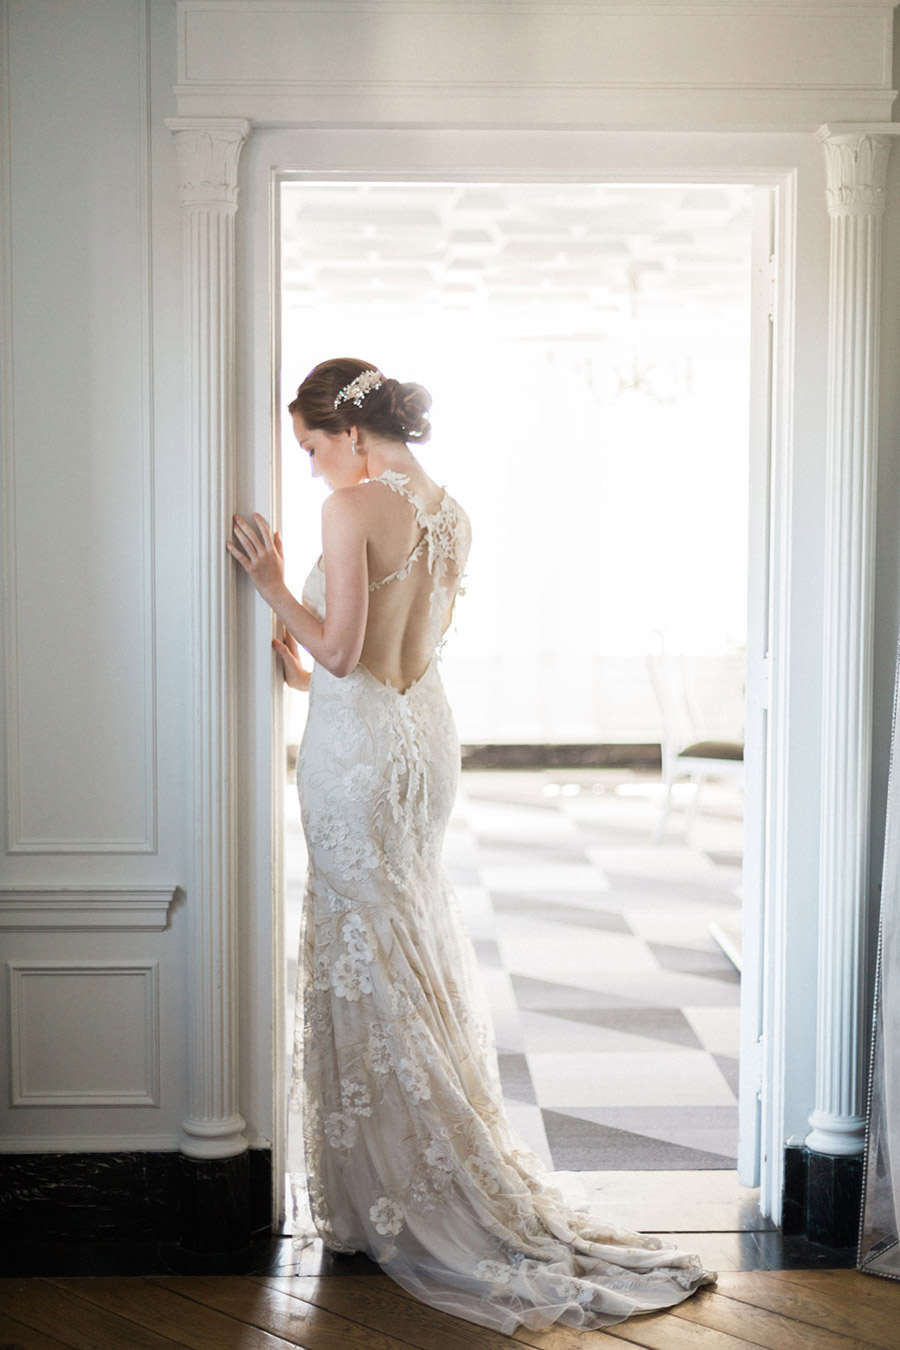 bel aire bridal accessories headpiece jennifer fujikawa photography 2016 chloe mint styled wedding shoot bv